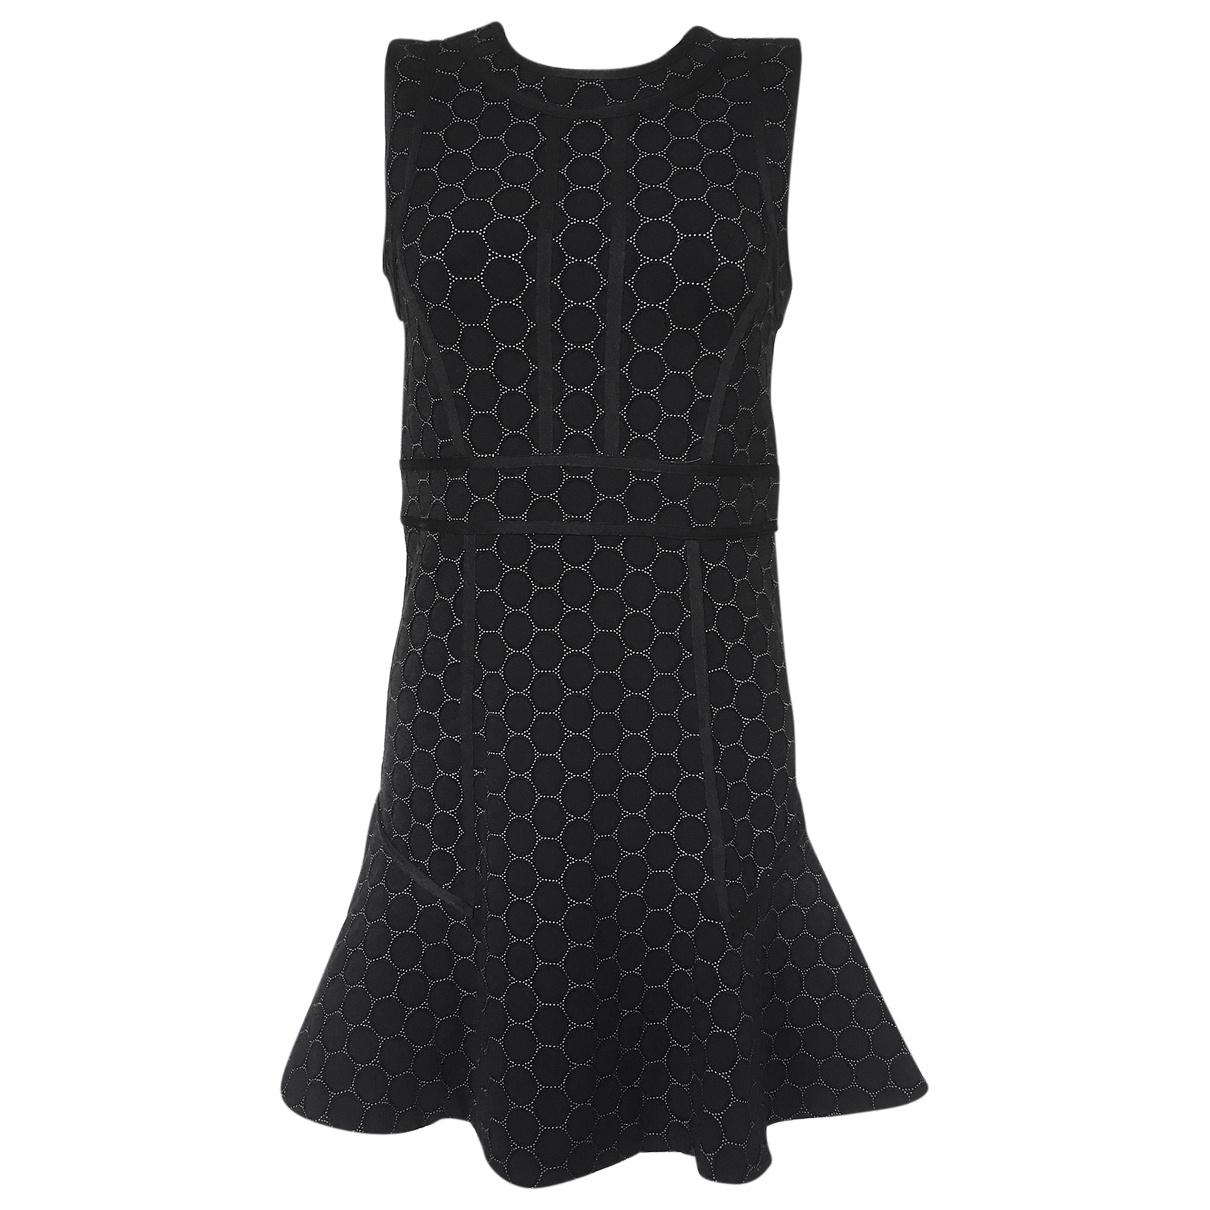 Marc By Marc Jacobs \N Black Silk dress for Women S International